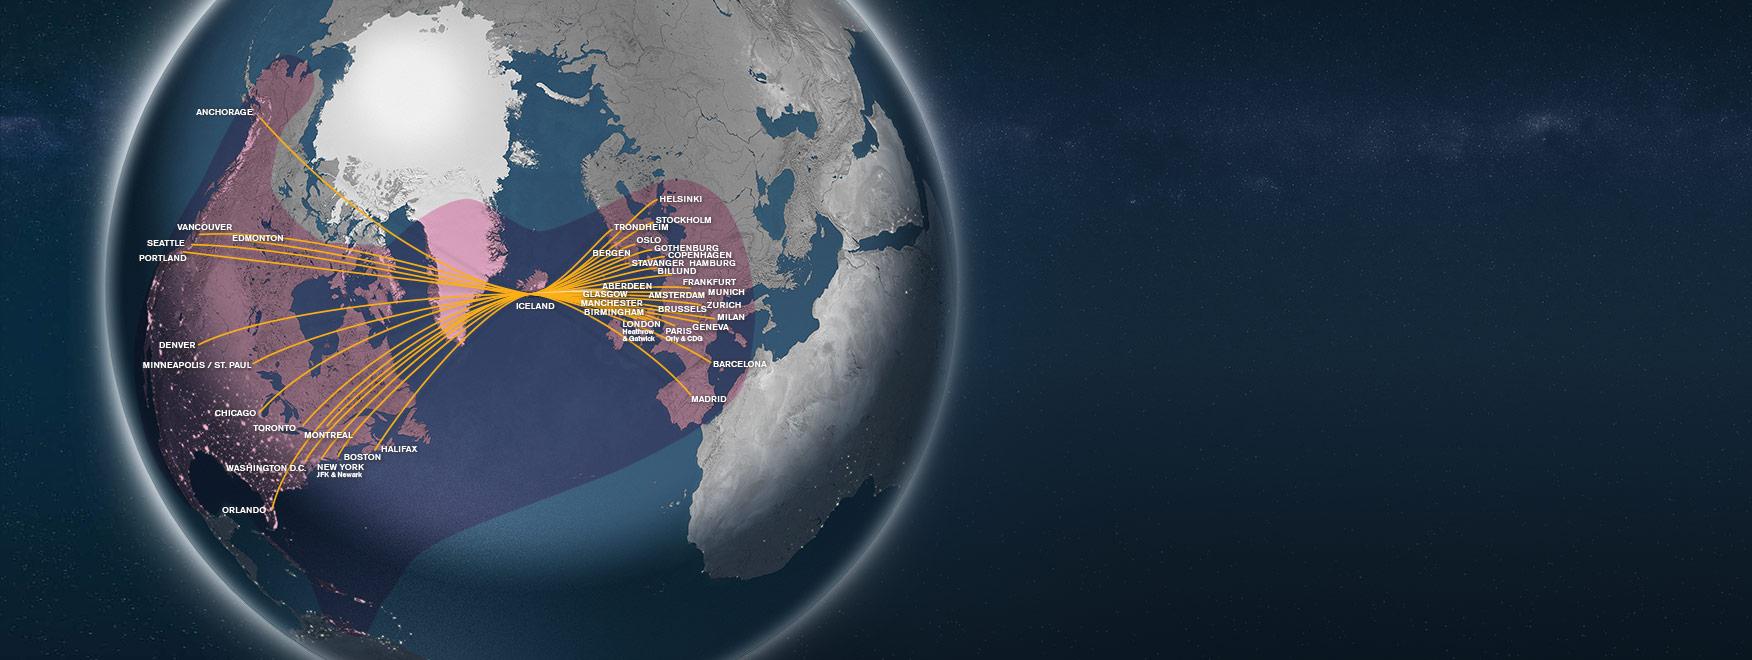 Wireless Internet On Board Icelandair Icelandair - Us internet coverage map minneapolis